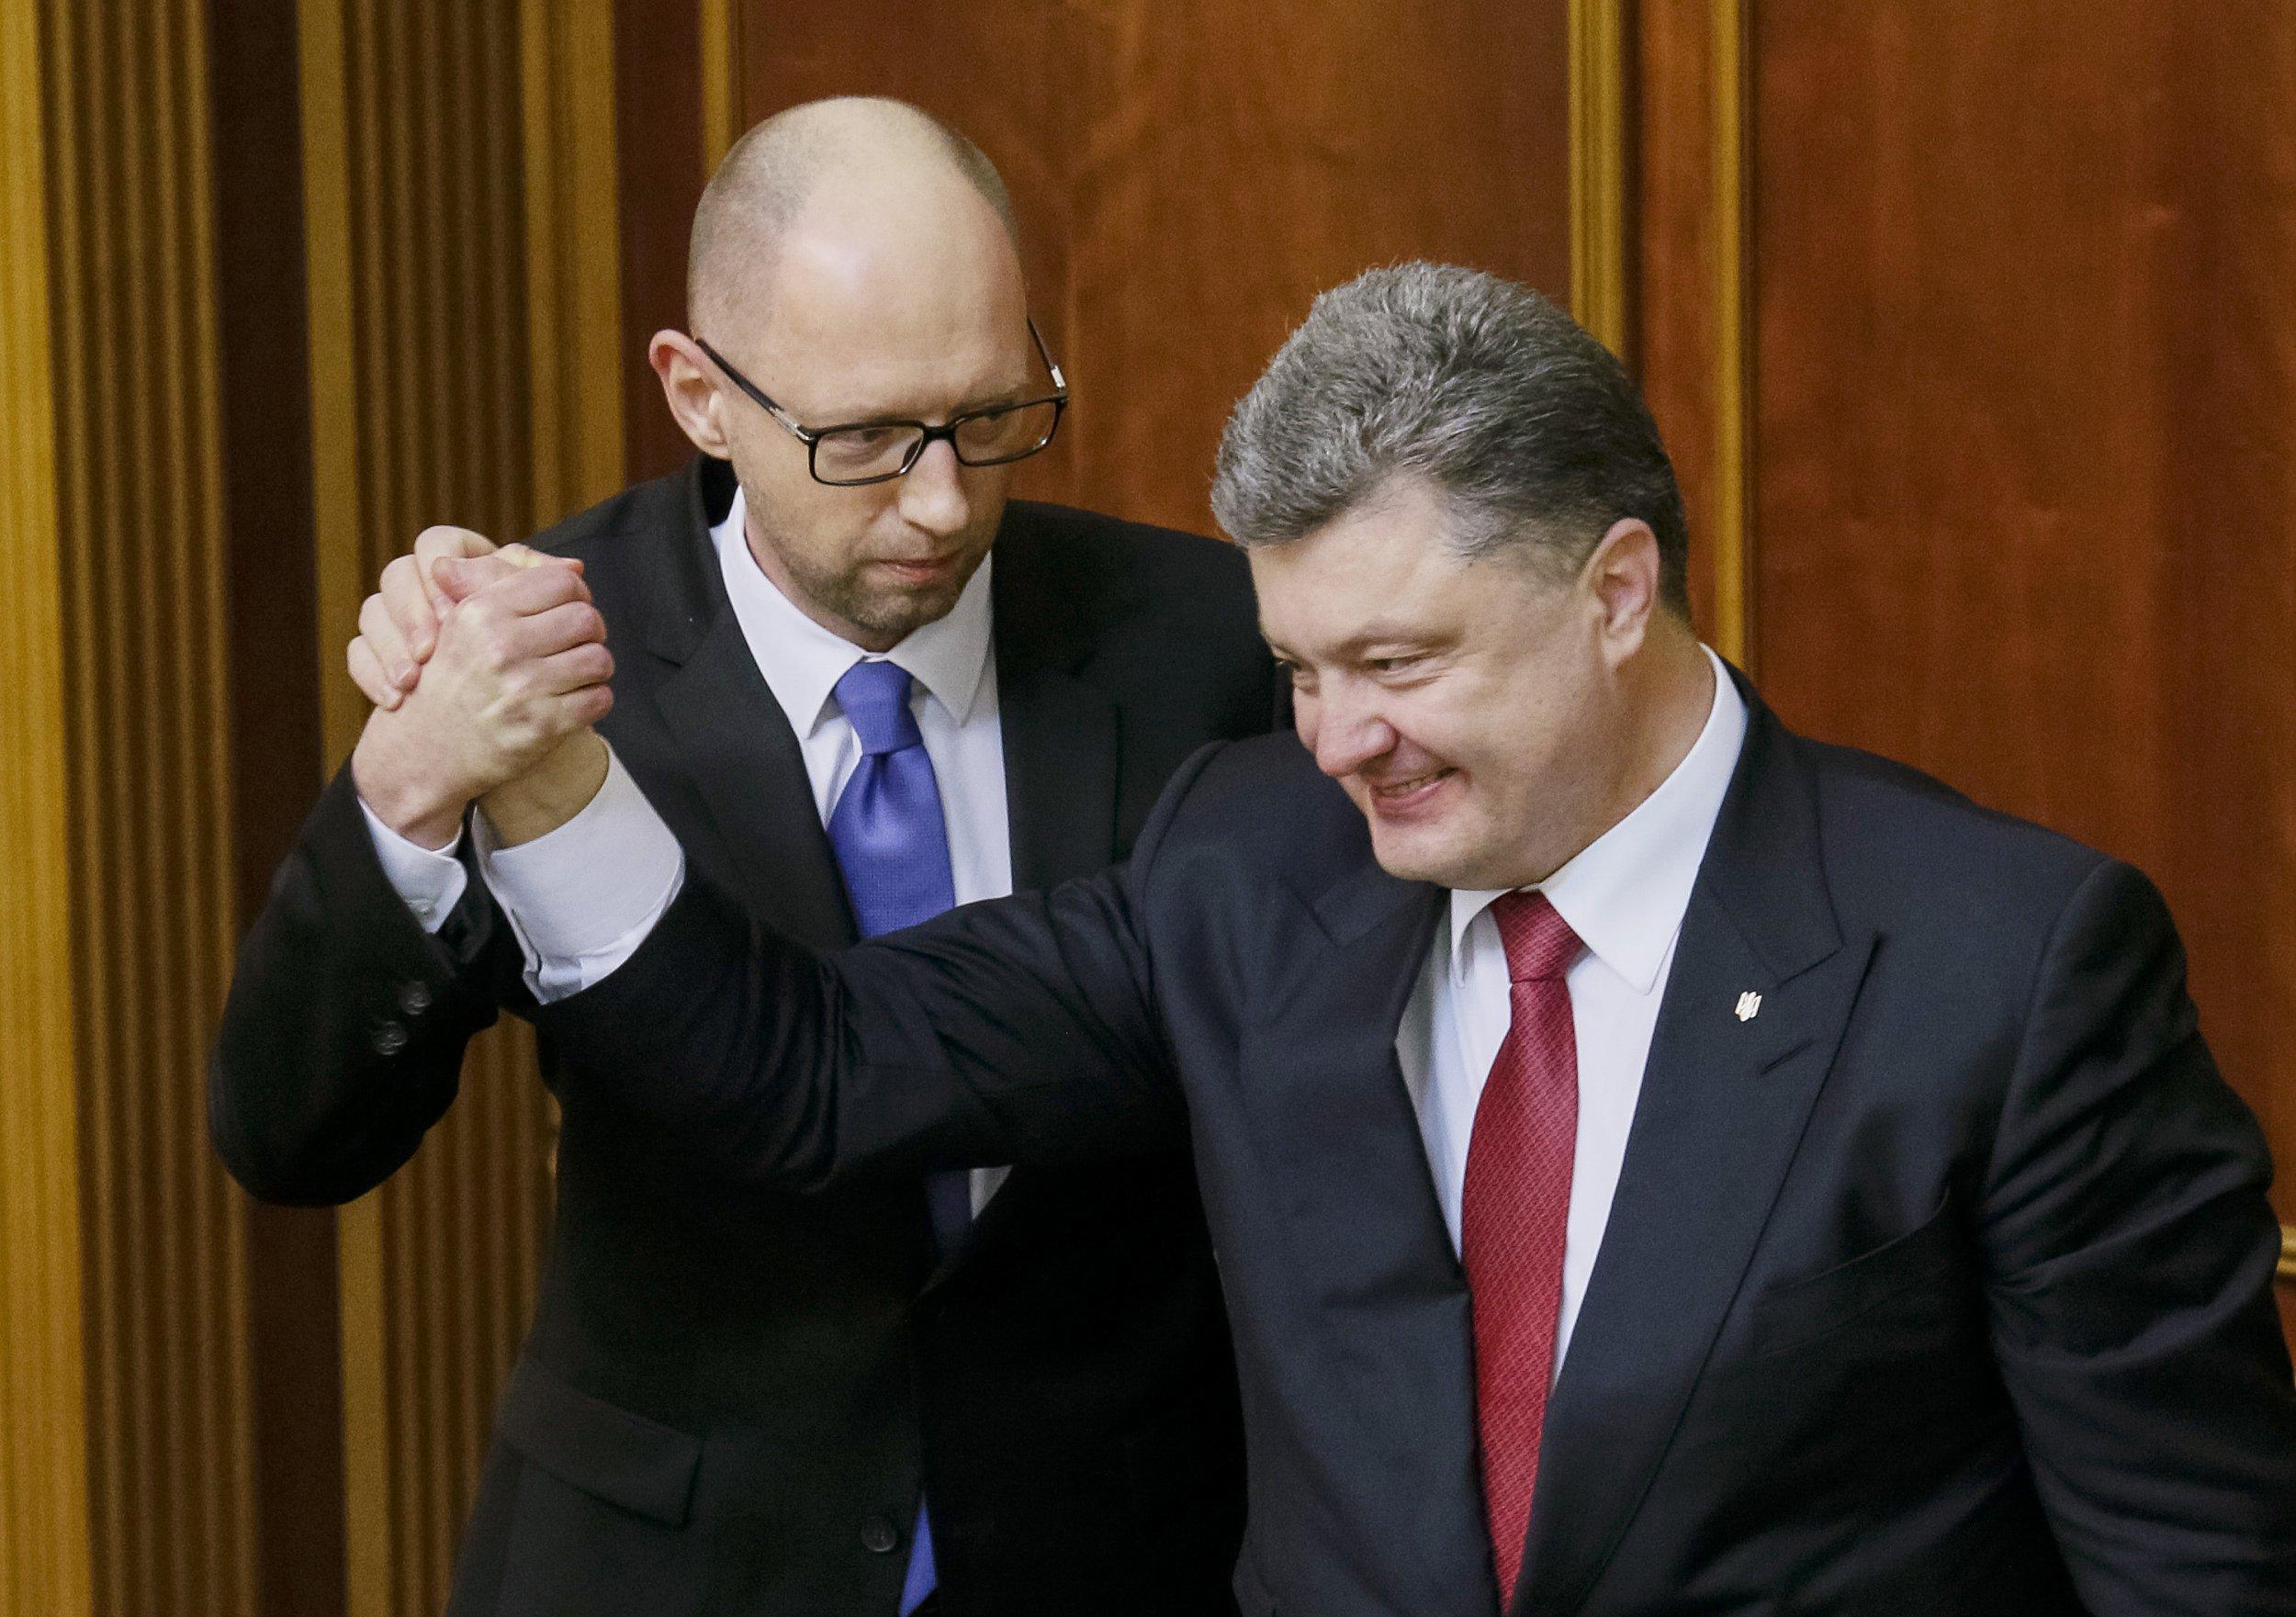 Ukrainian Prime Minister Arseny Yatseniuk (L) and President Petro Poroshenko (R)